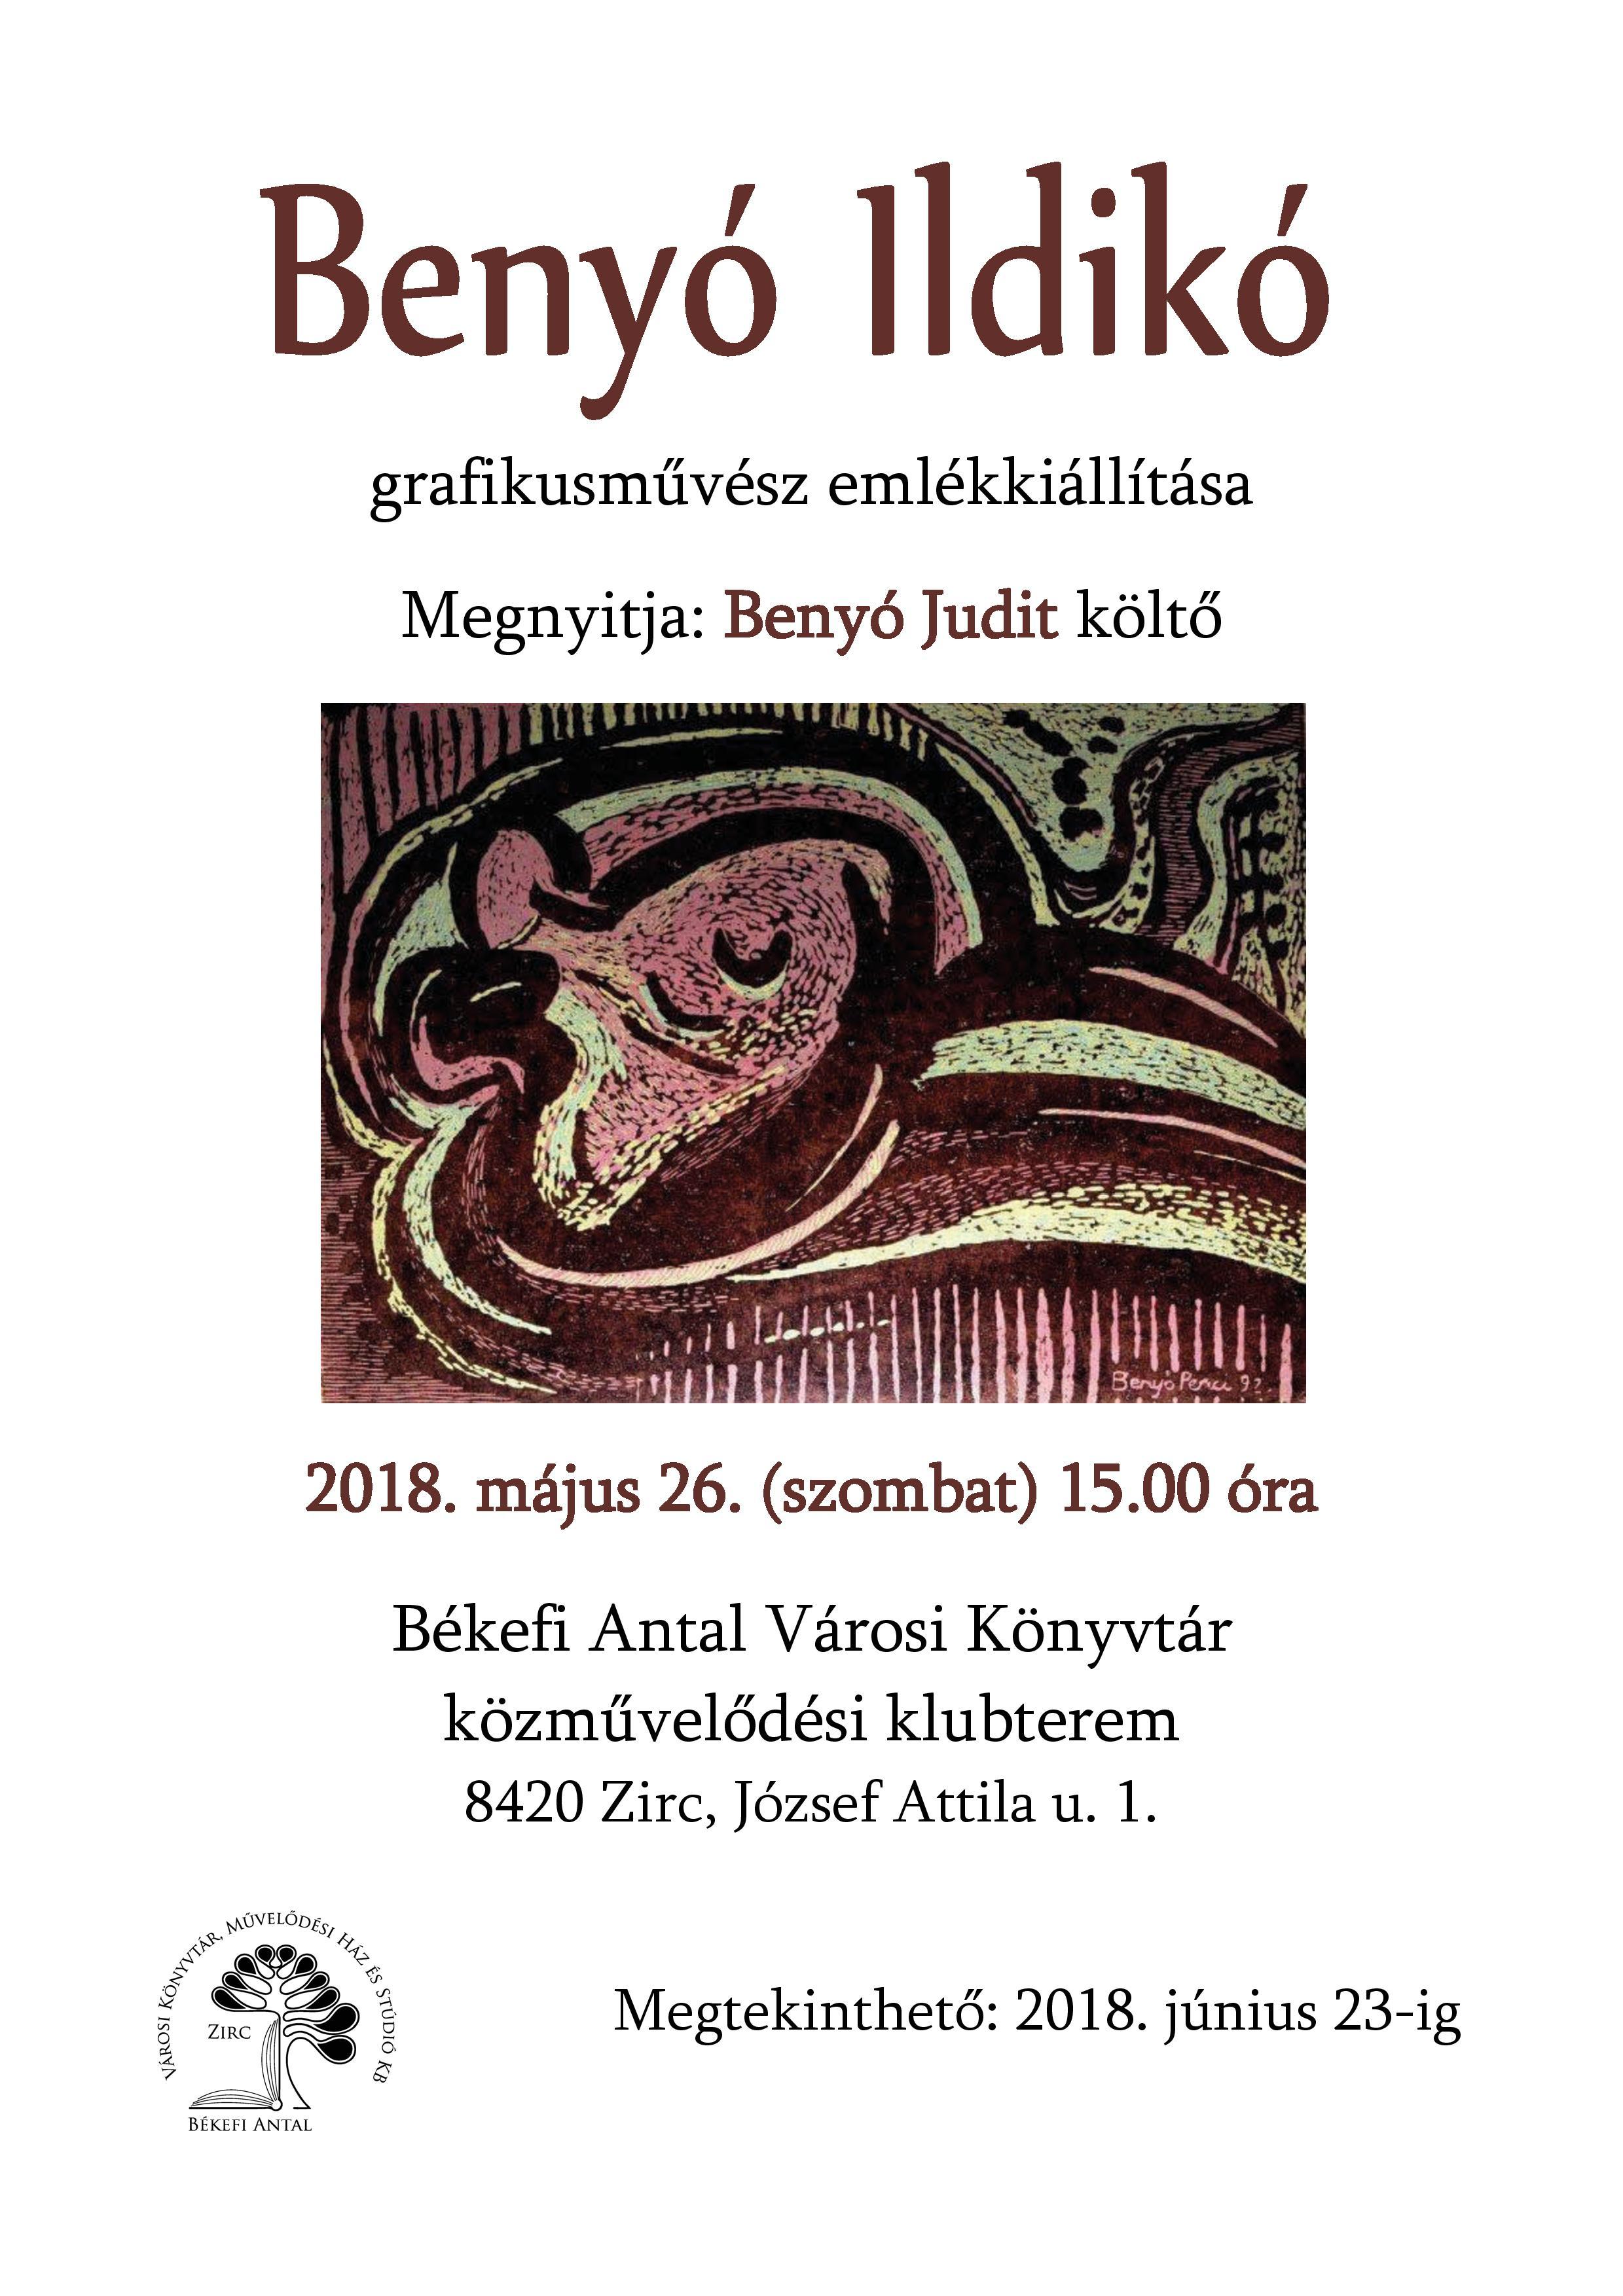 2018-05-26_benyo_ildiko_plakat-page-001.jpg